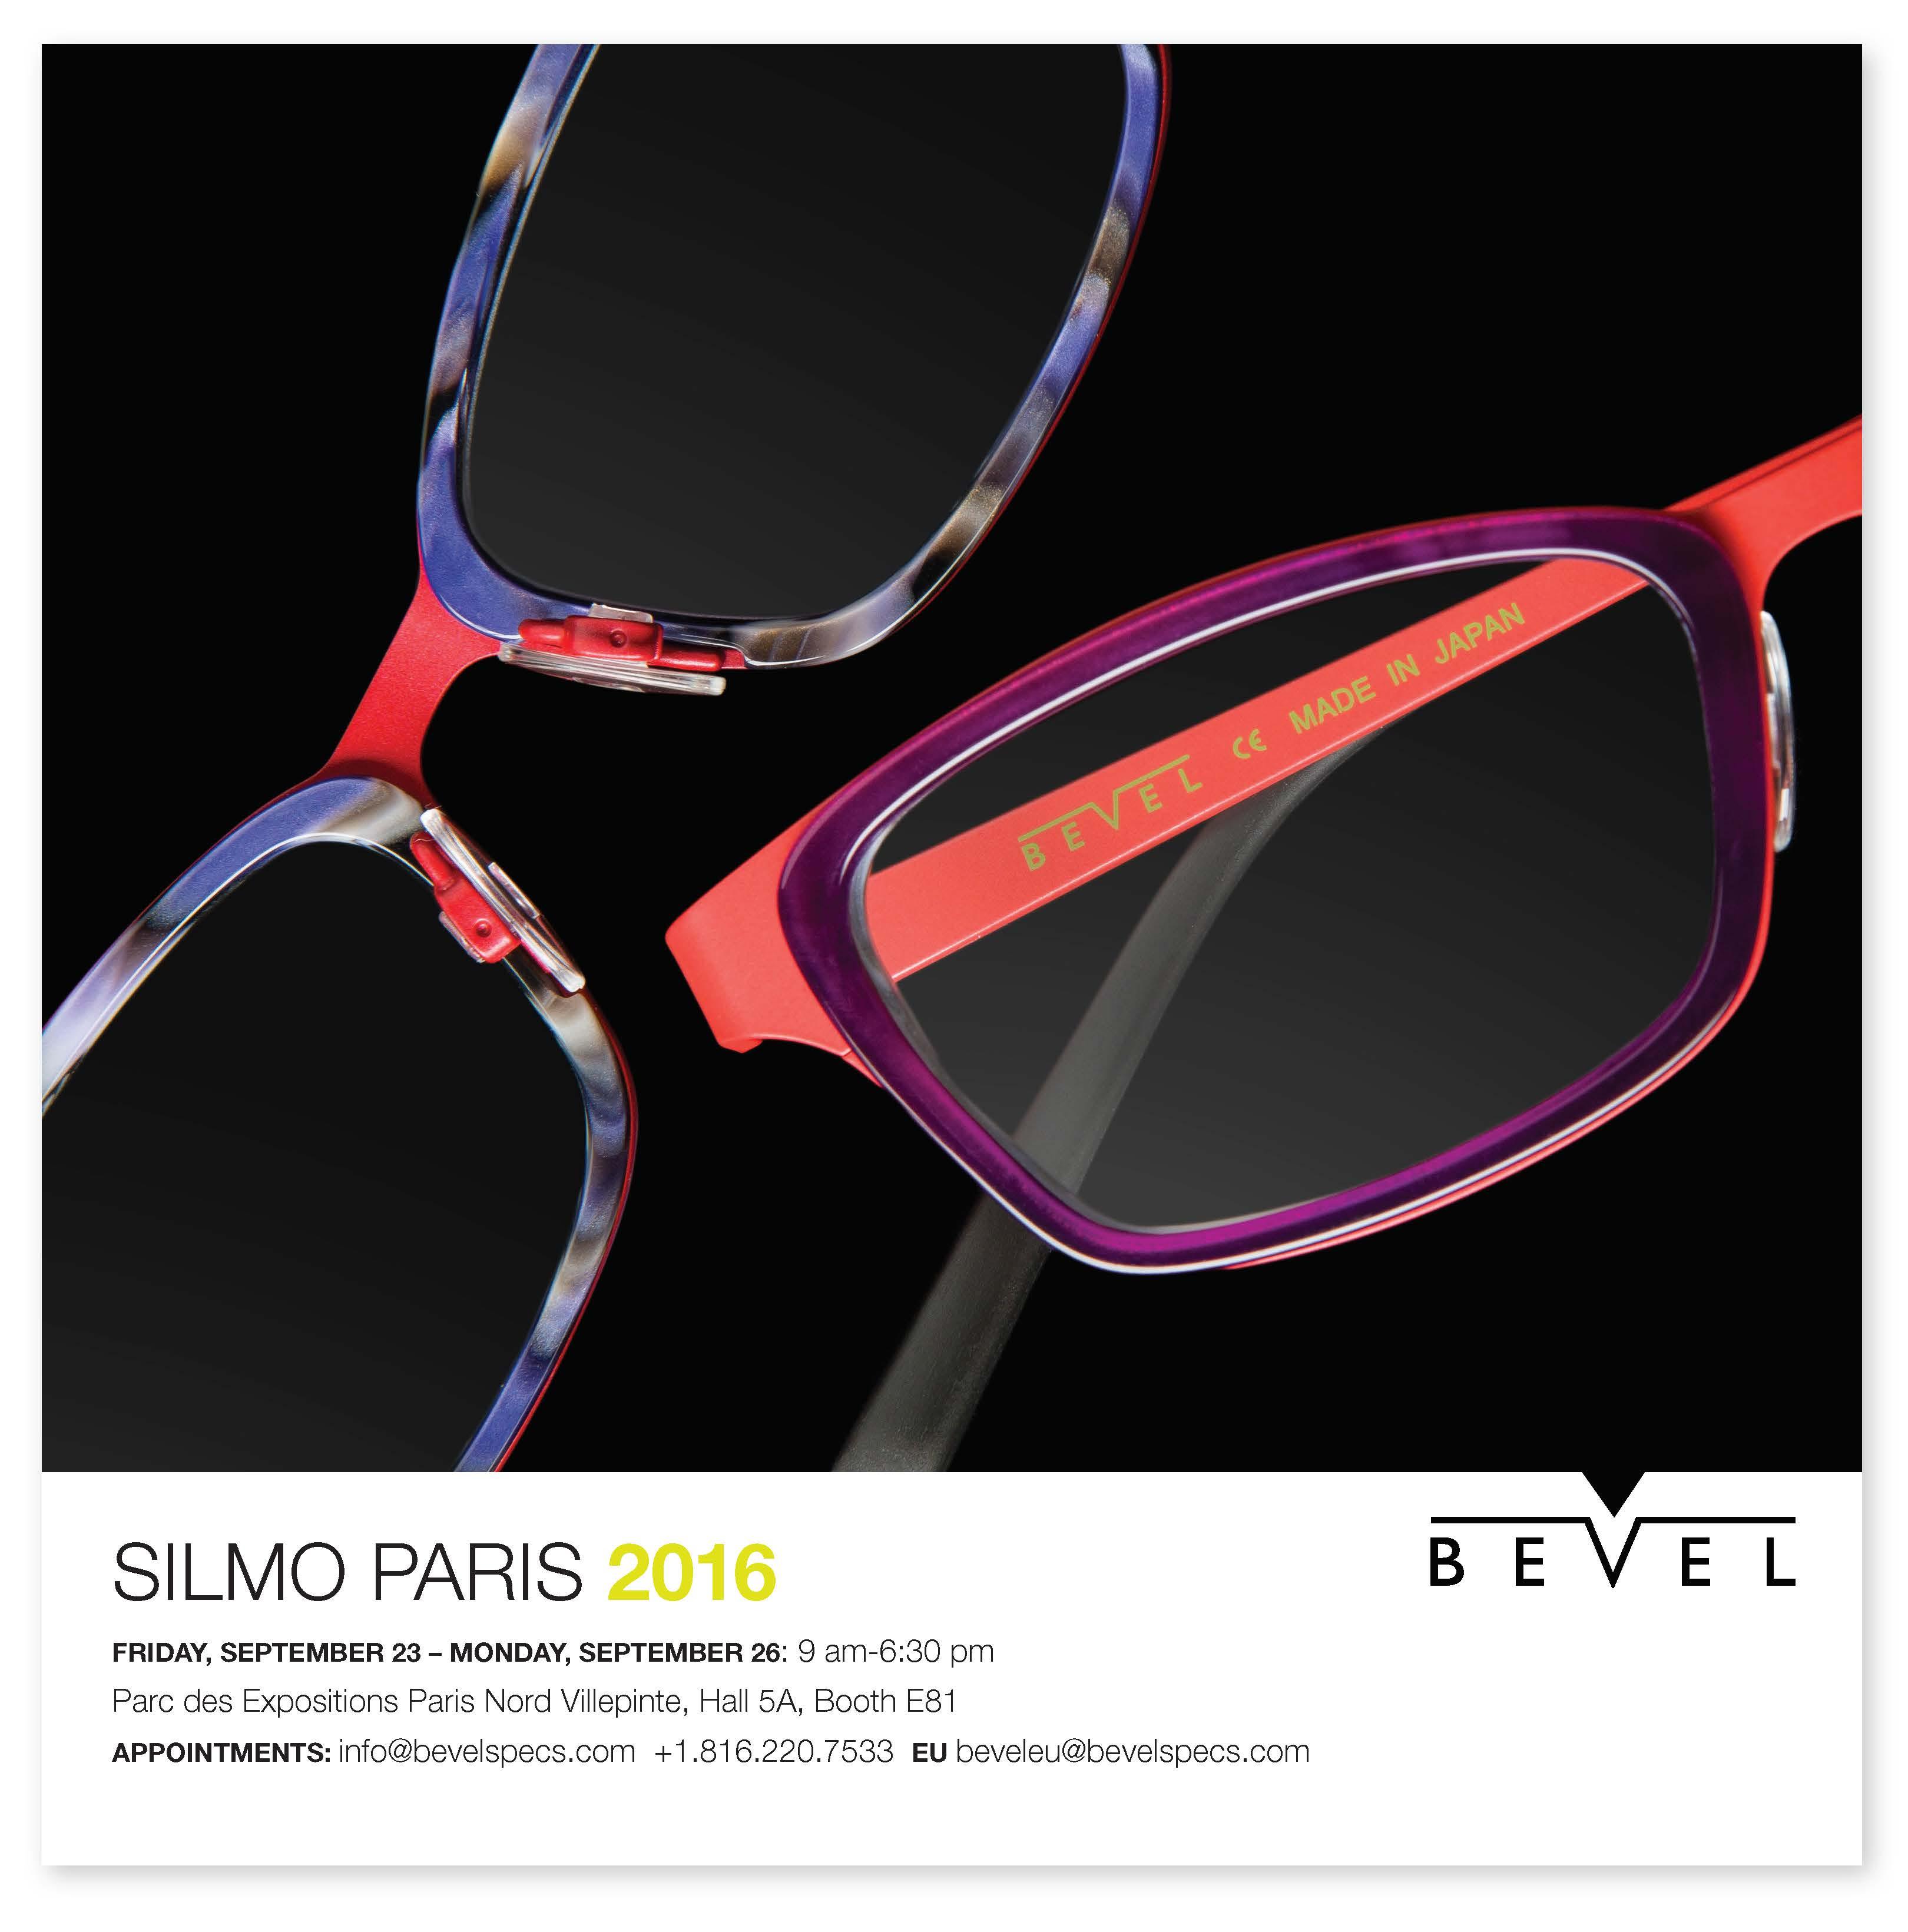 Upcoming Shows! Paris Silmo